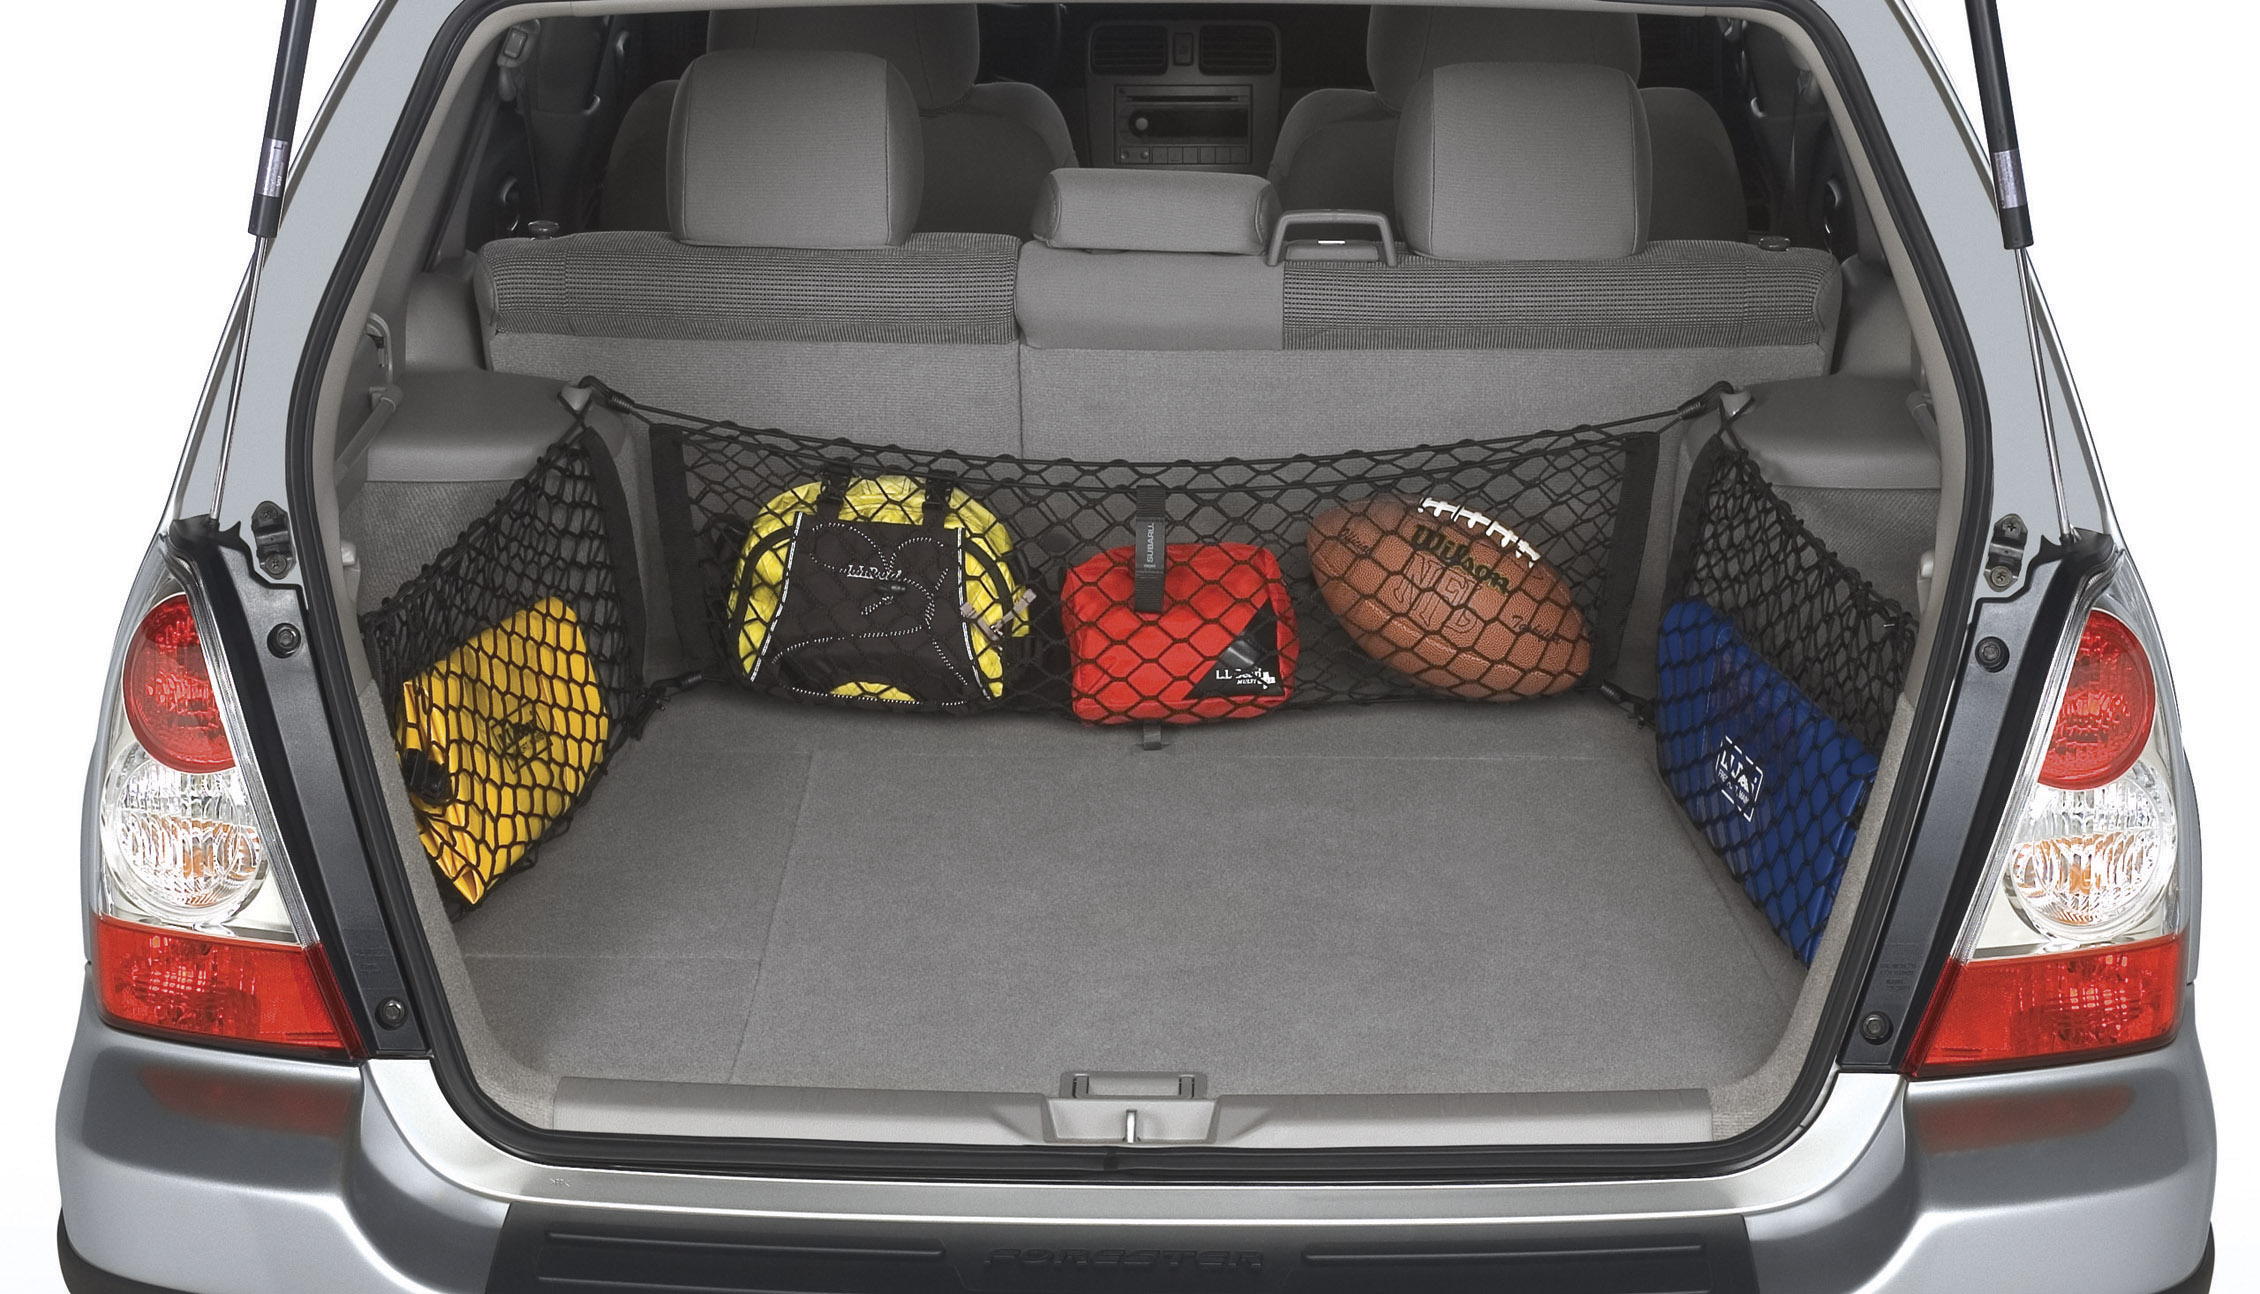 2006 Subaru Forester Cargo Net